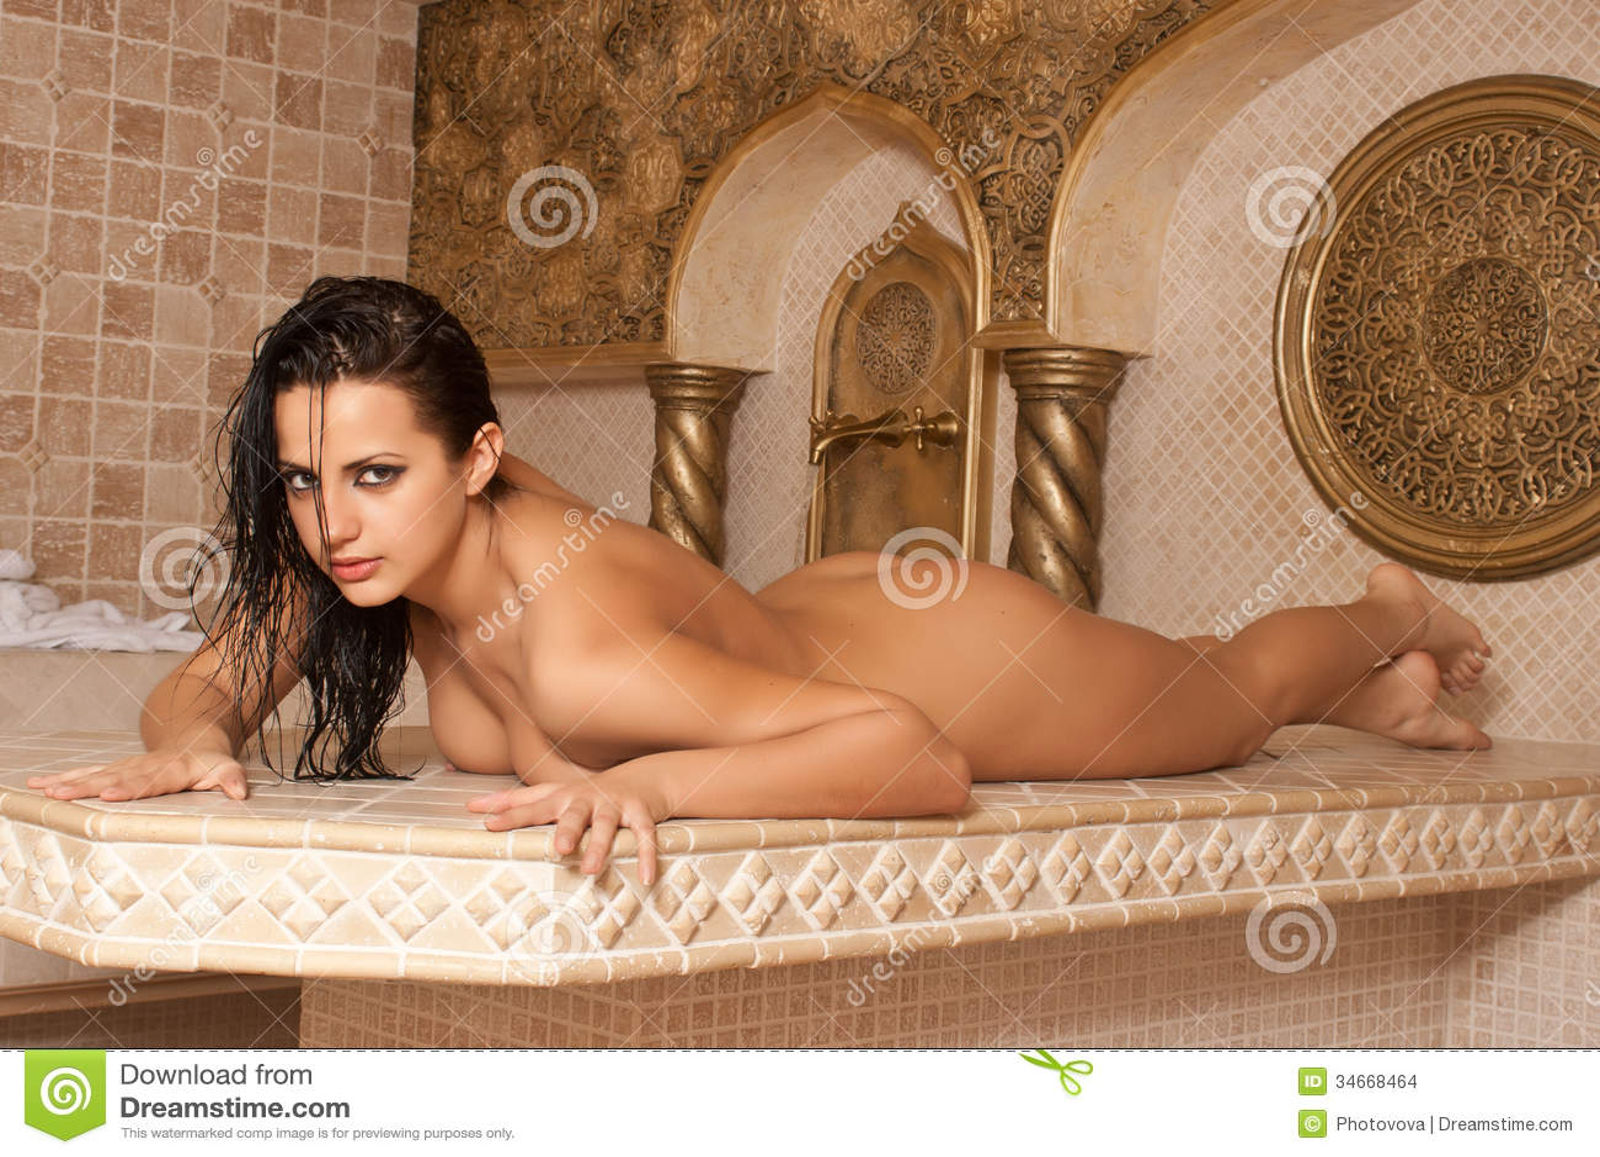 Adult sensual massage landeveissykkel dame